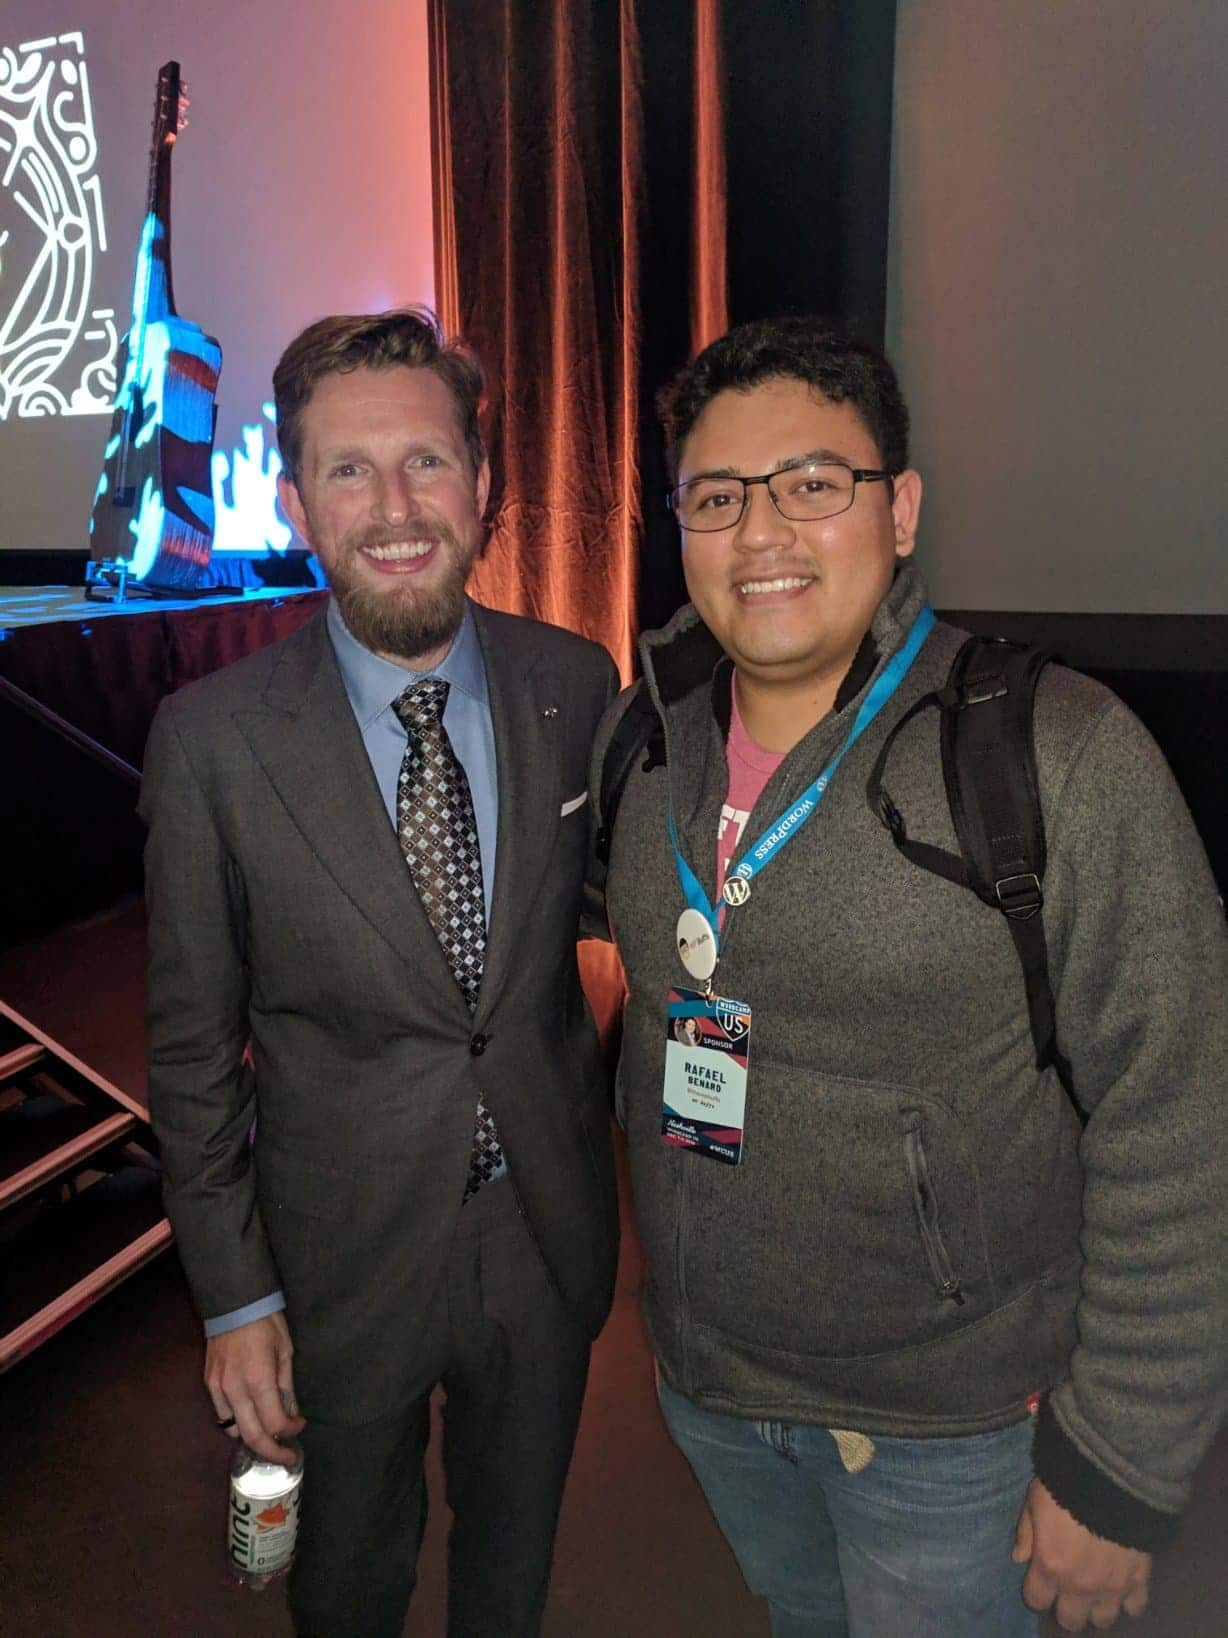 Rafael Benard (Kinsta) with Matt Mullenweg